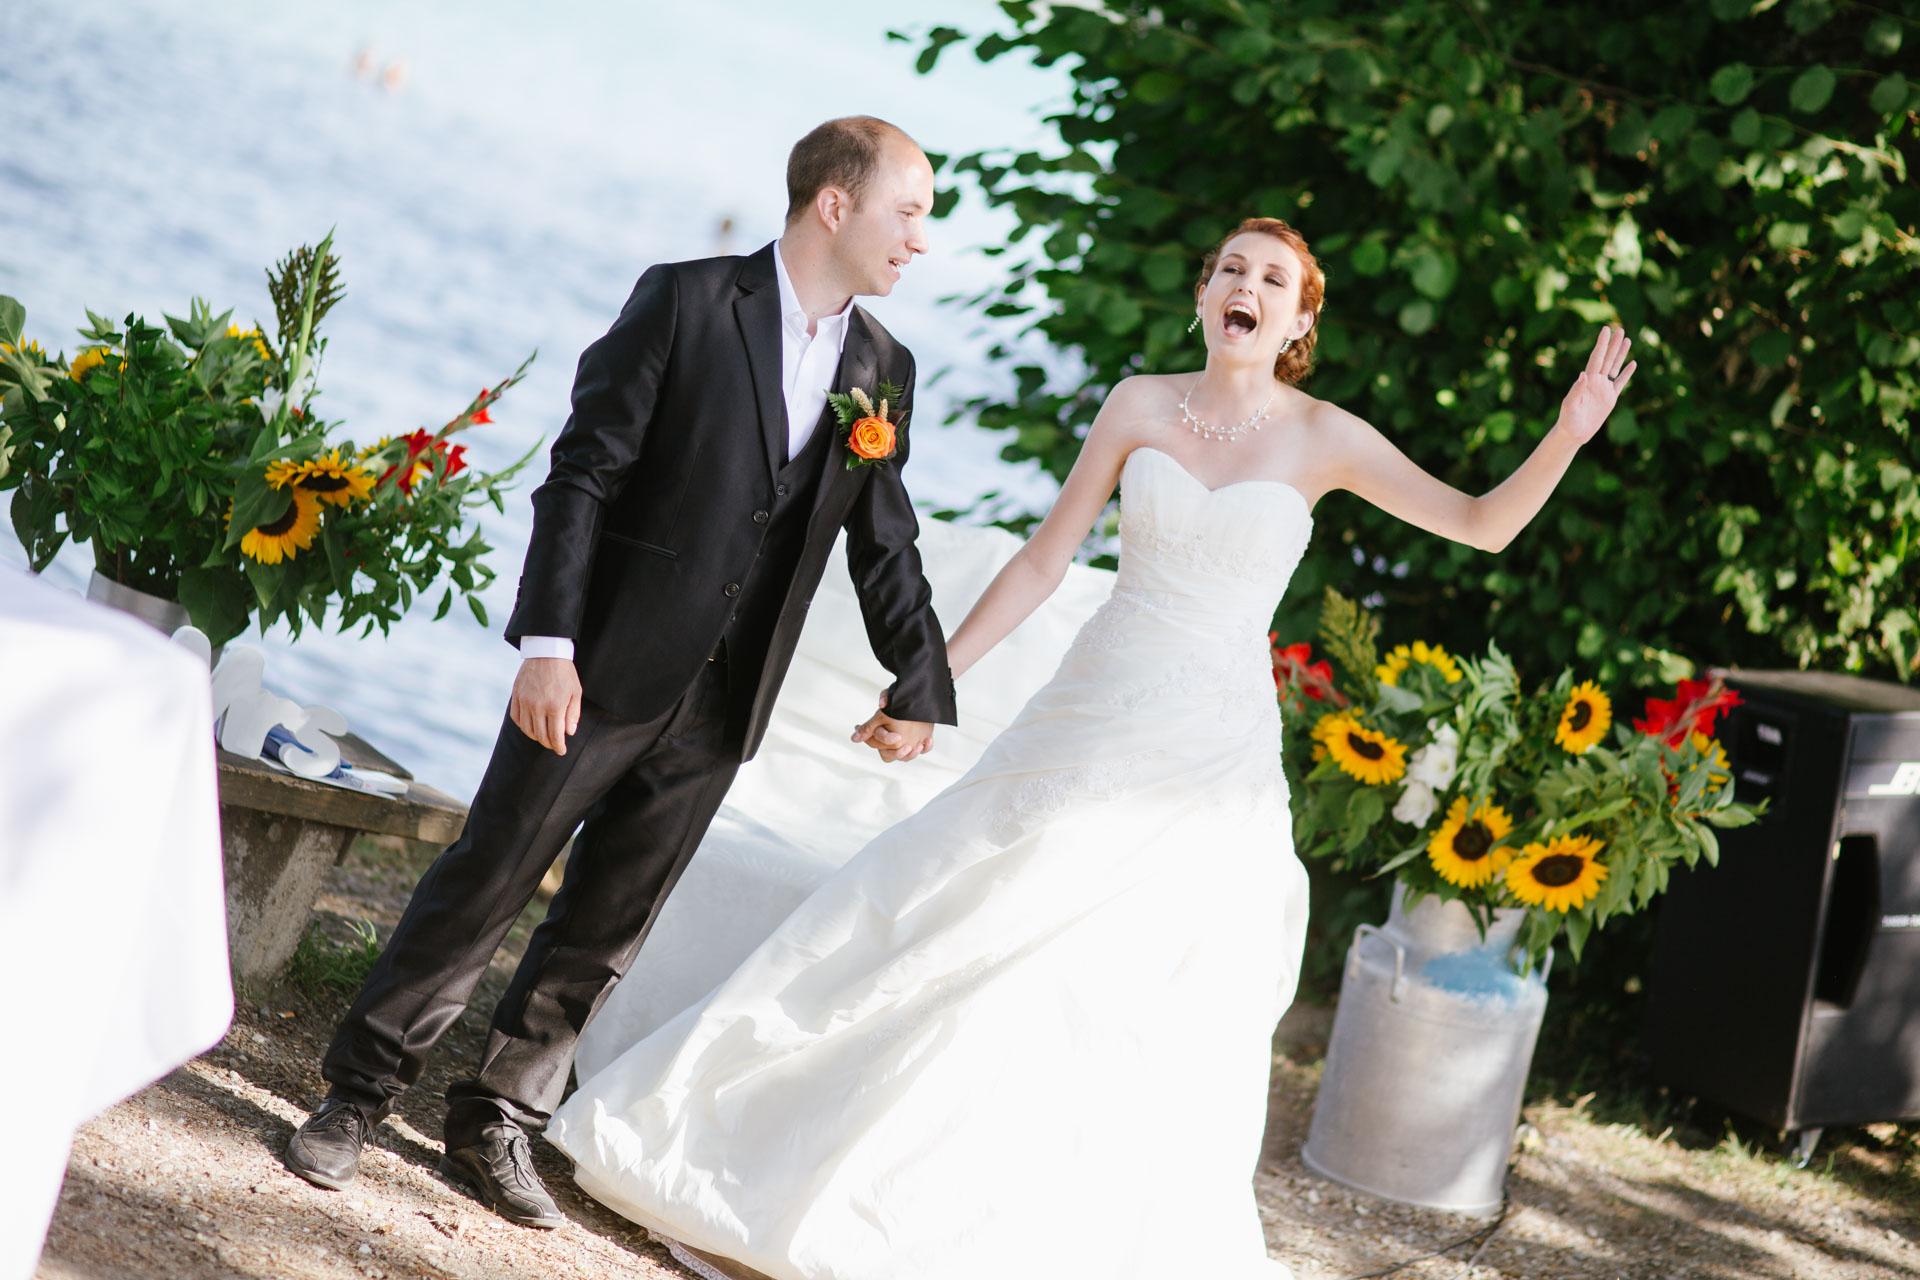 Pixelart_Hochzeitsfotografen_Loerrach_Rheinfelden_Hallwil_Schweiz_Linda-Ramon-1040